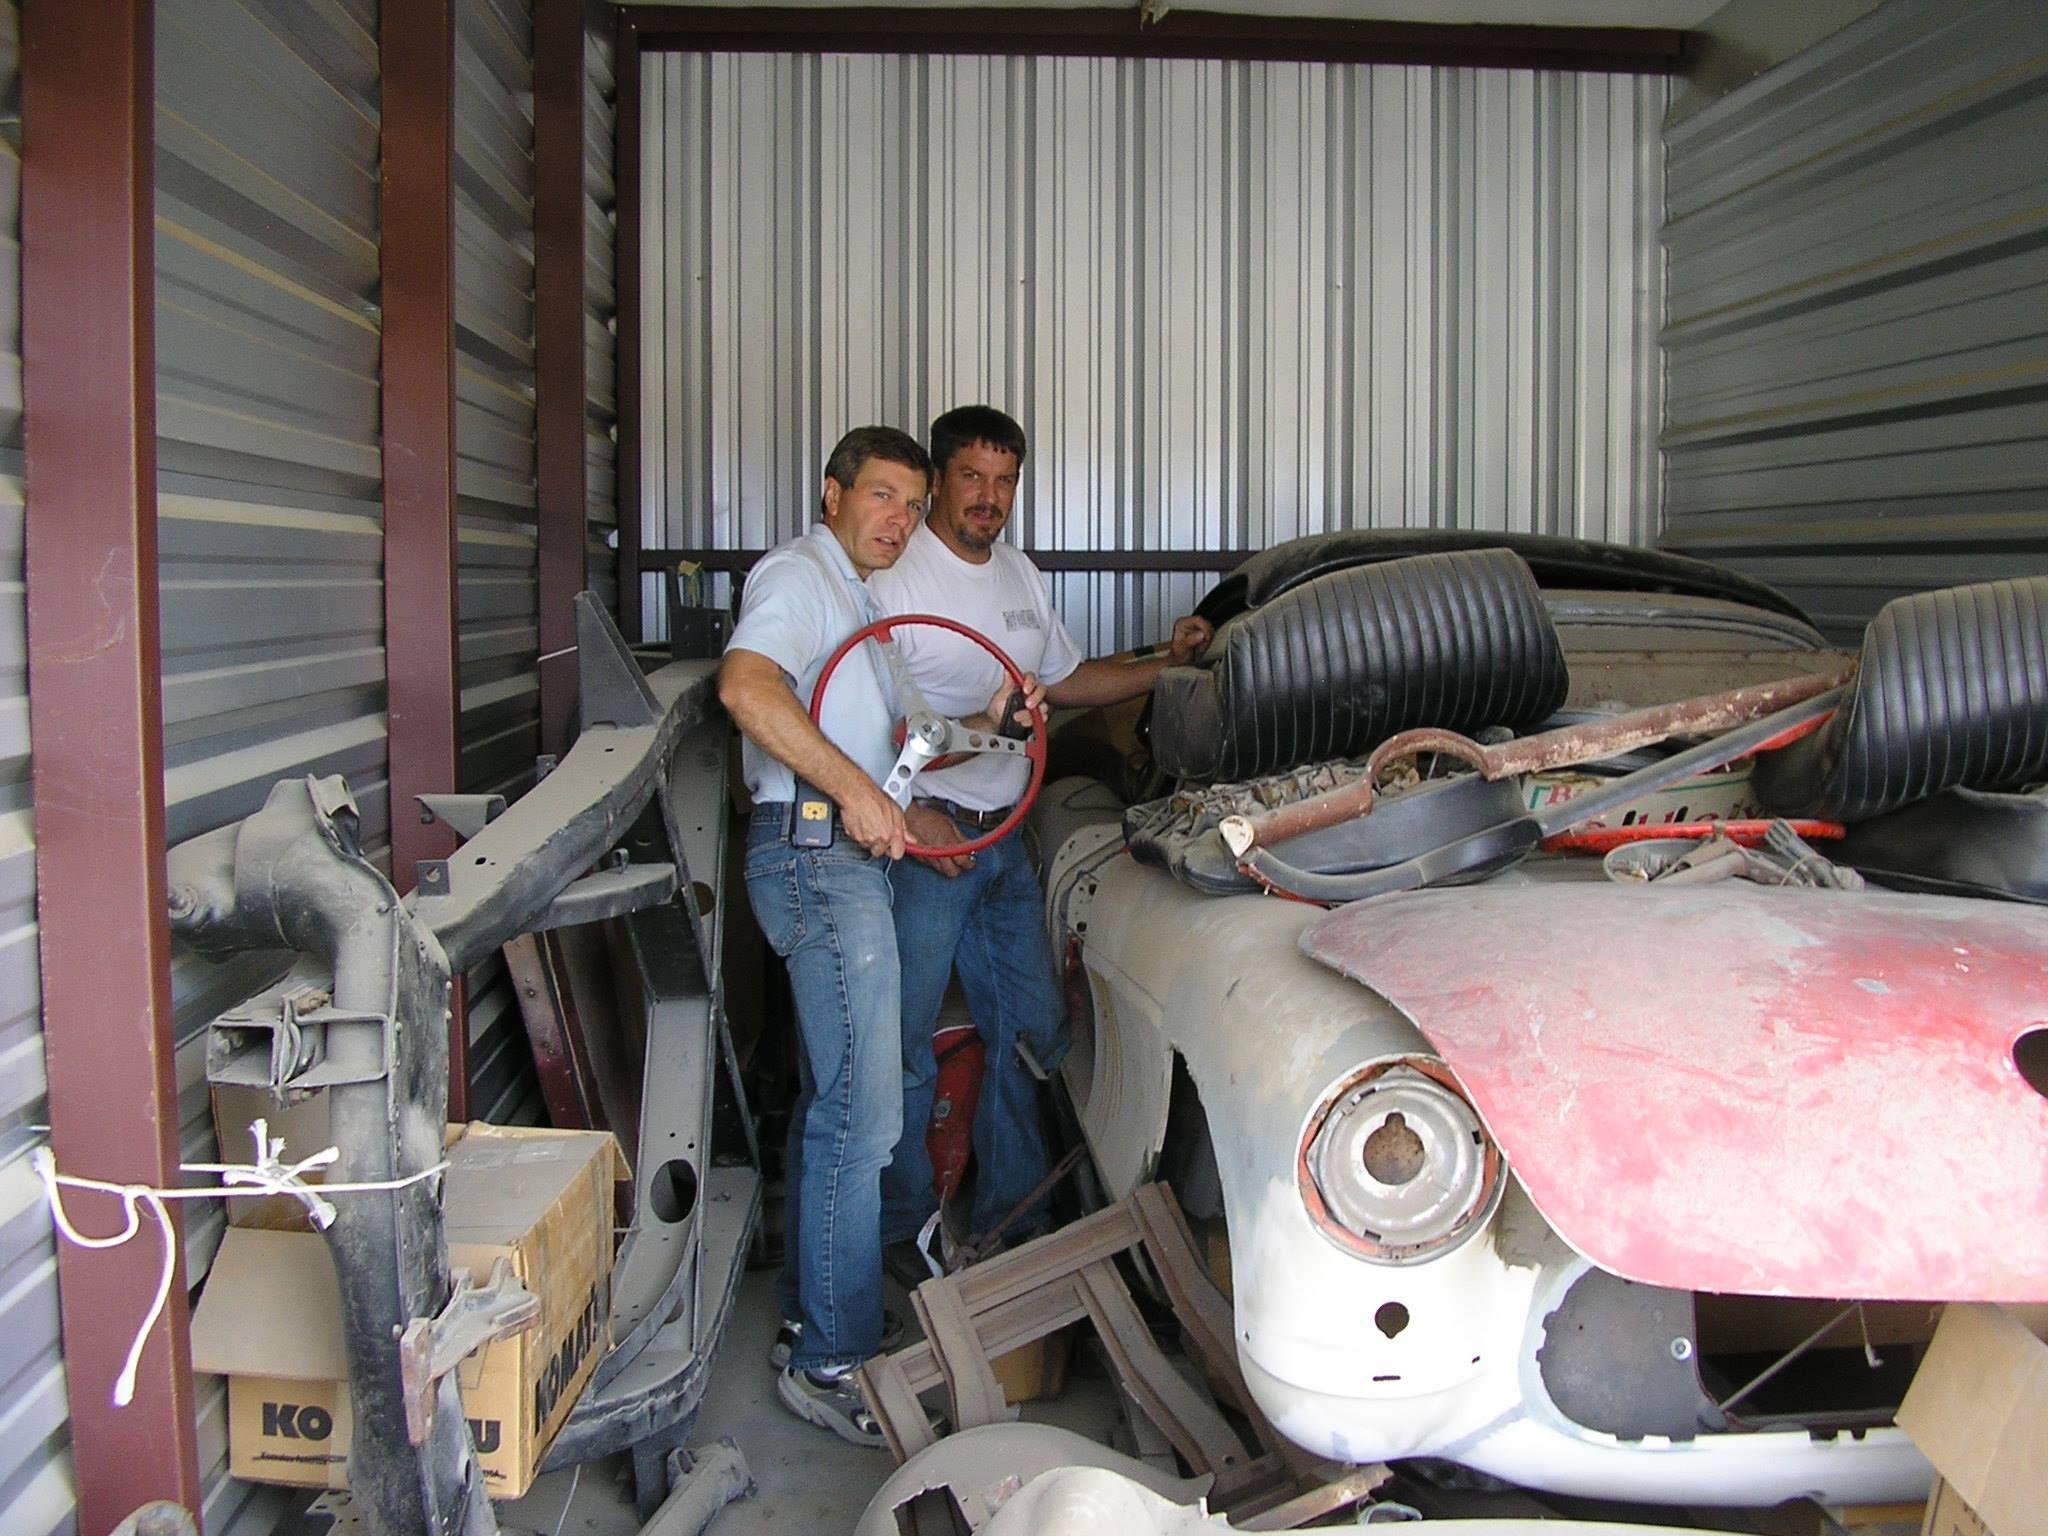 1957 FI Barn Corvette | Corvette, Barn find cars, Barn finds